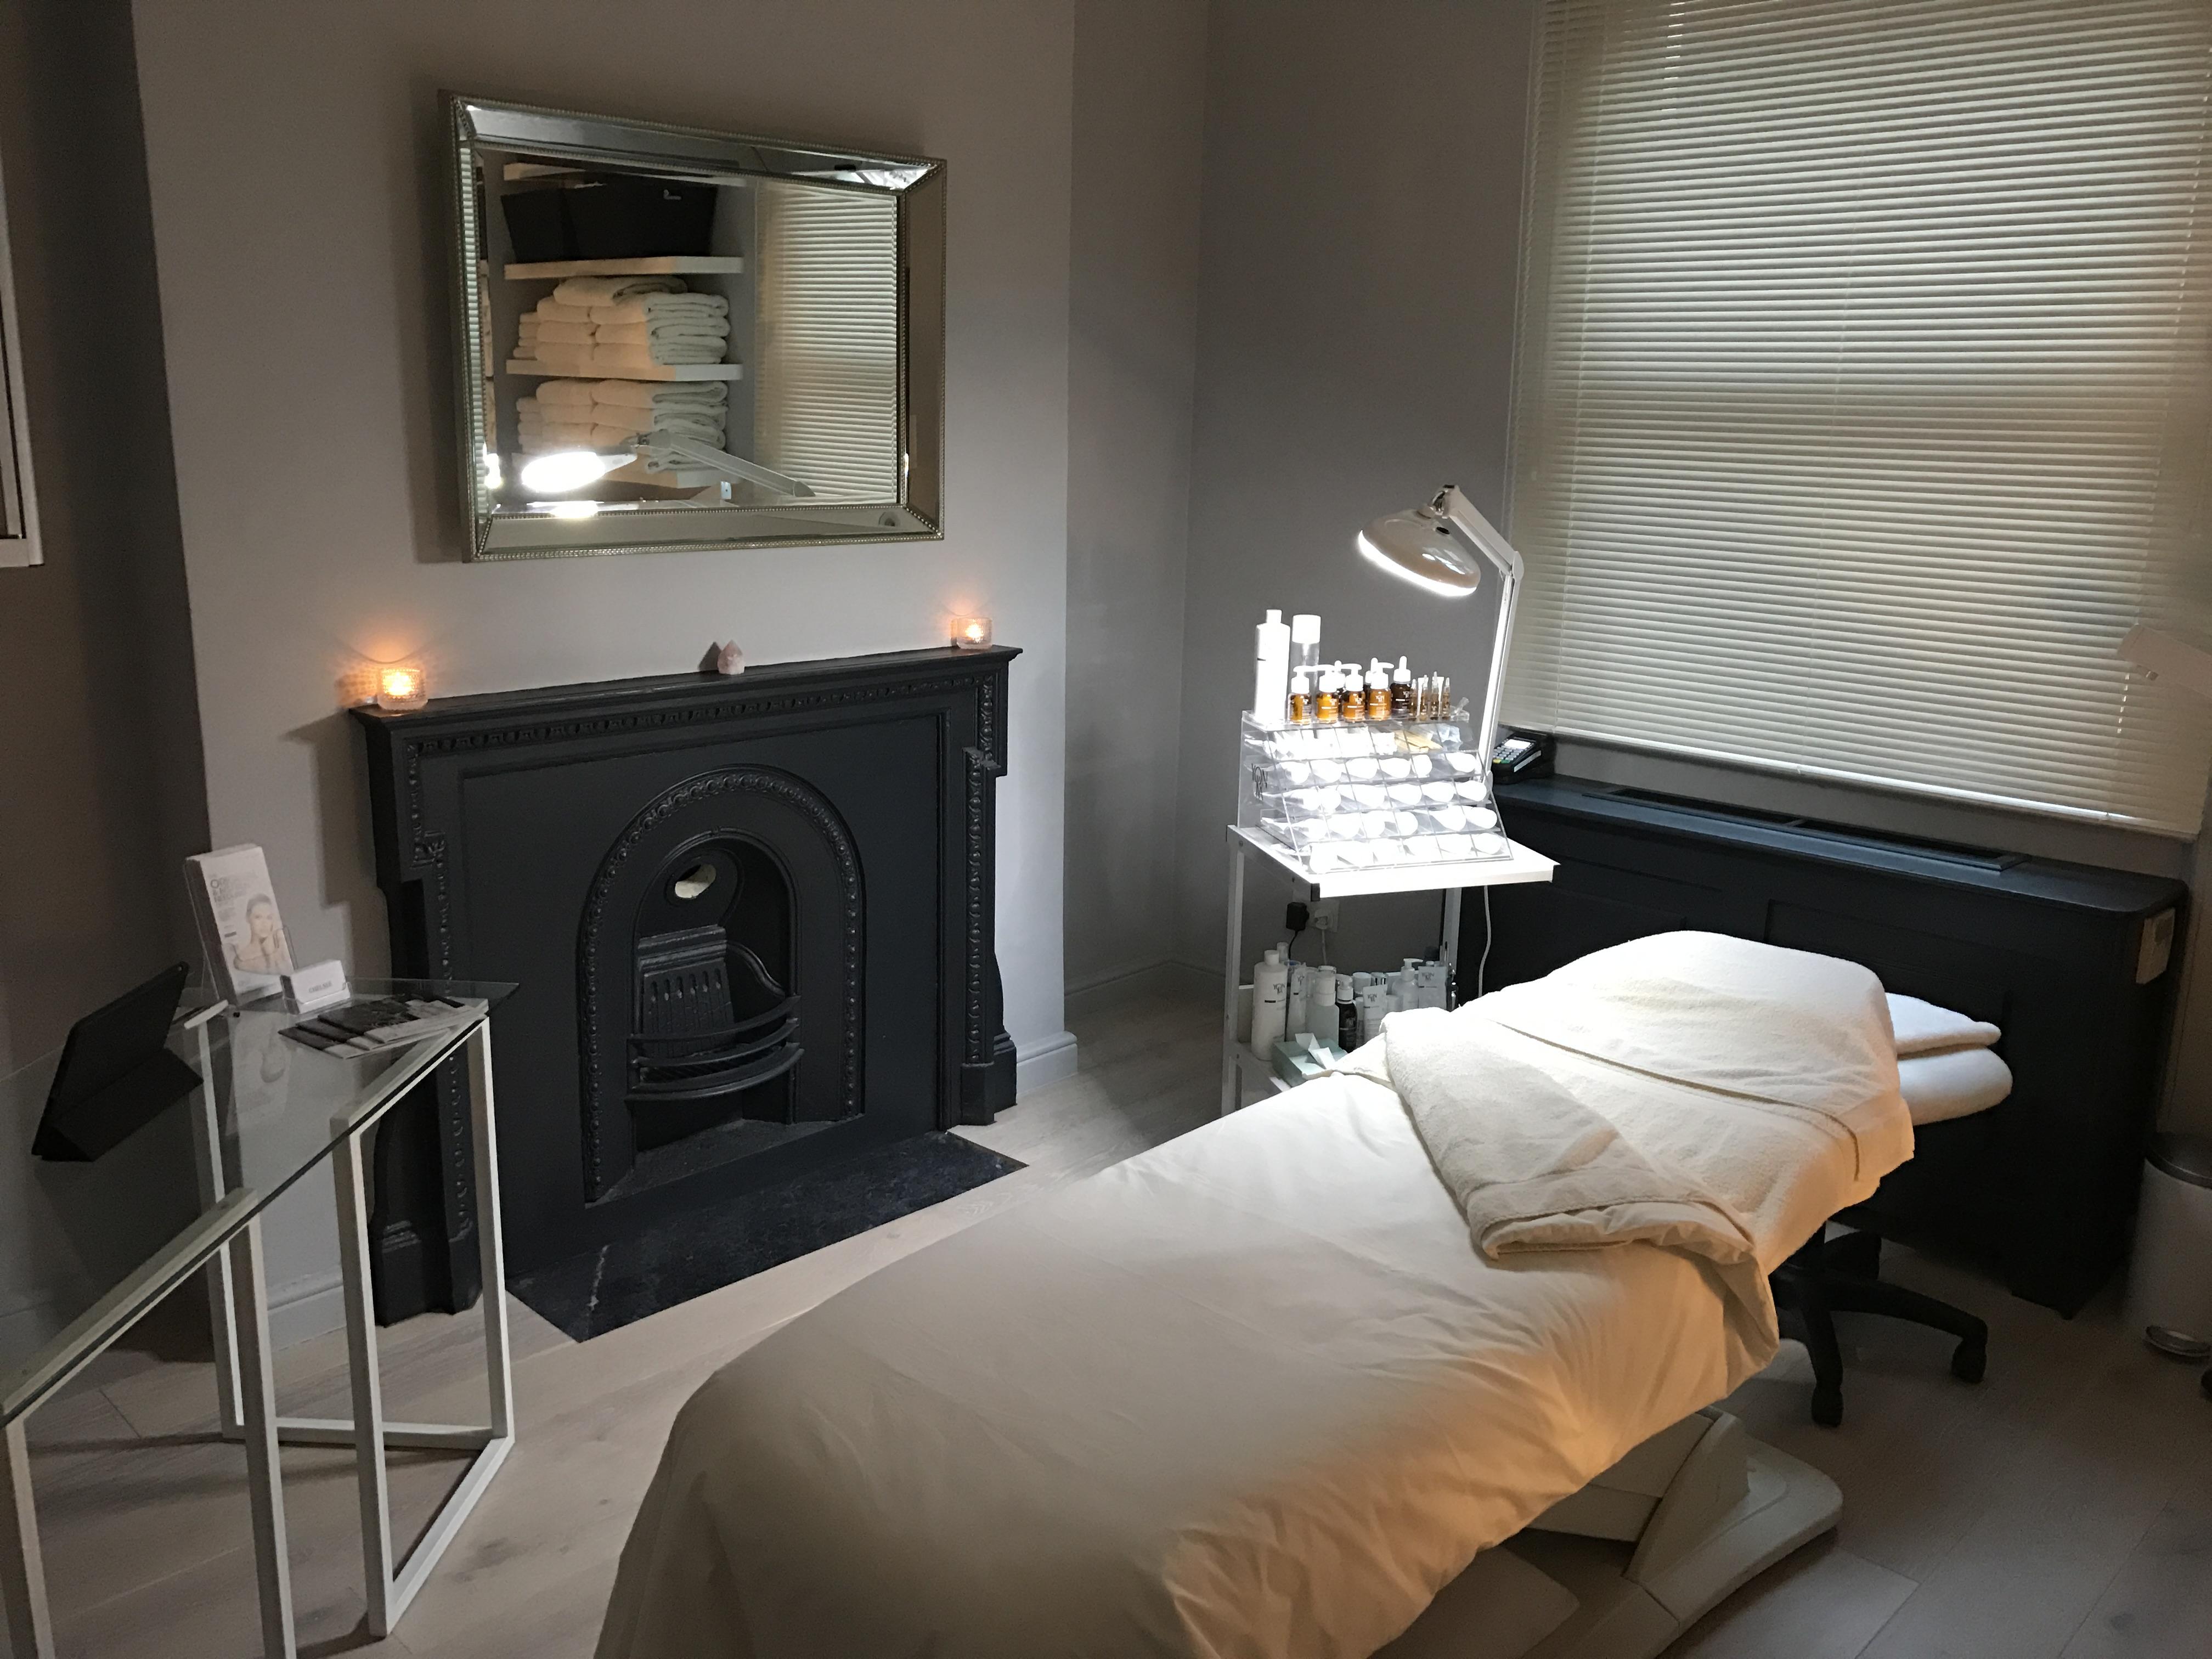 Shelf showcasing beauty treatment products